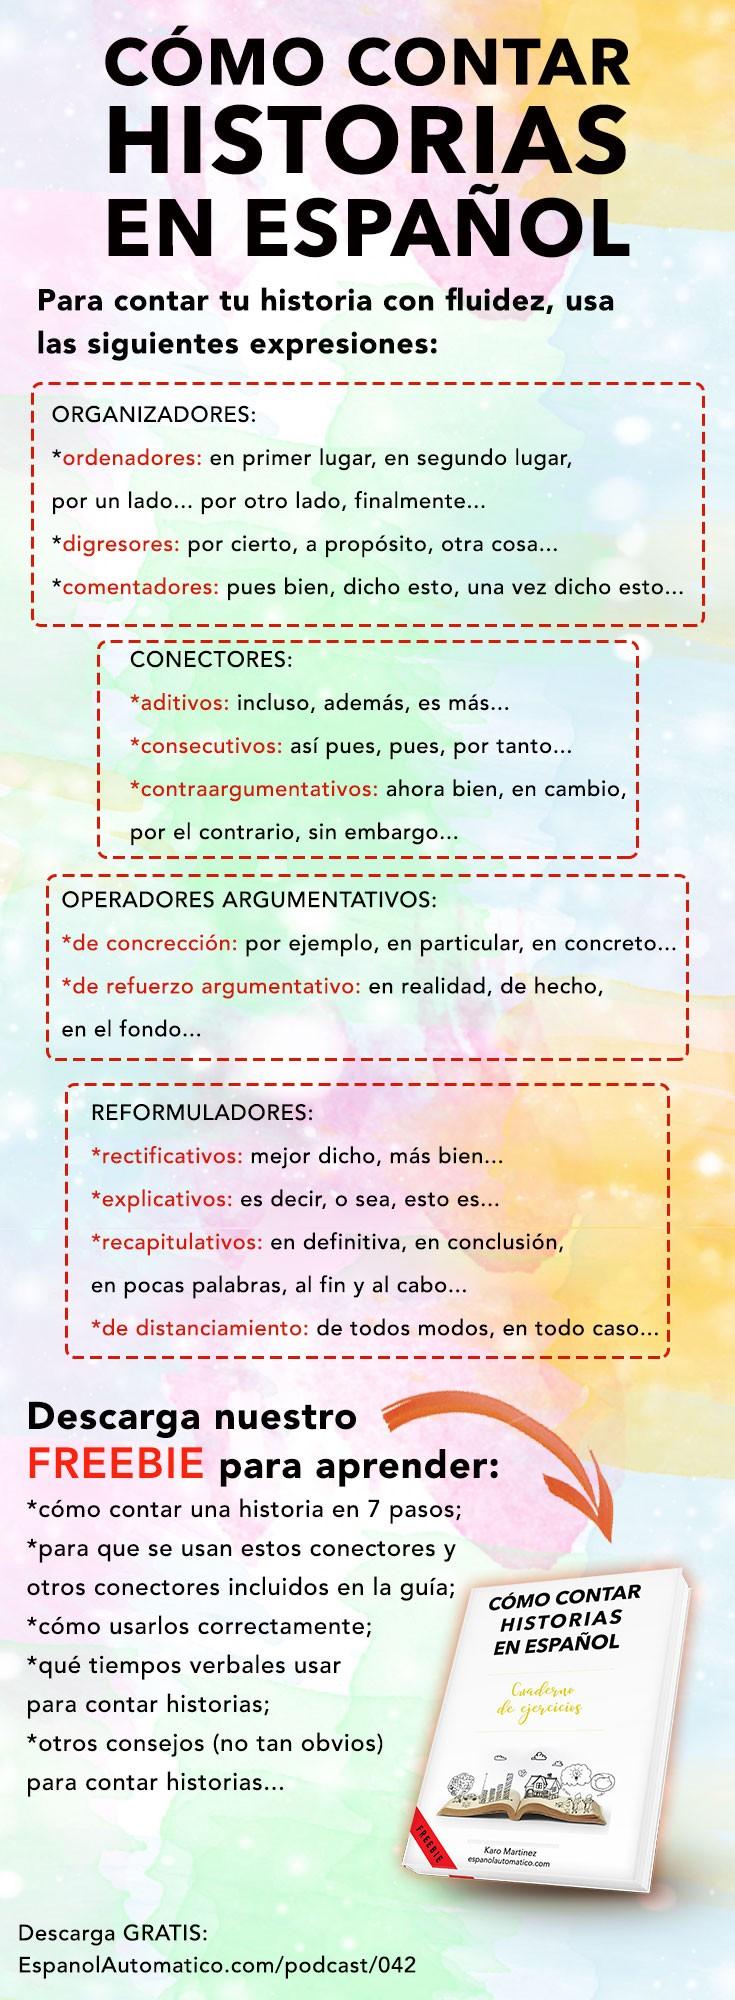 como contar historias en español